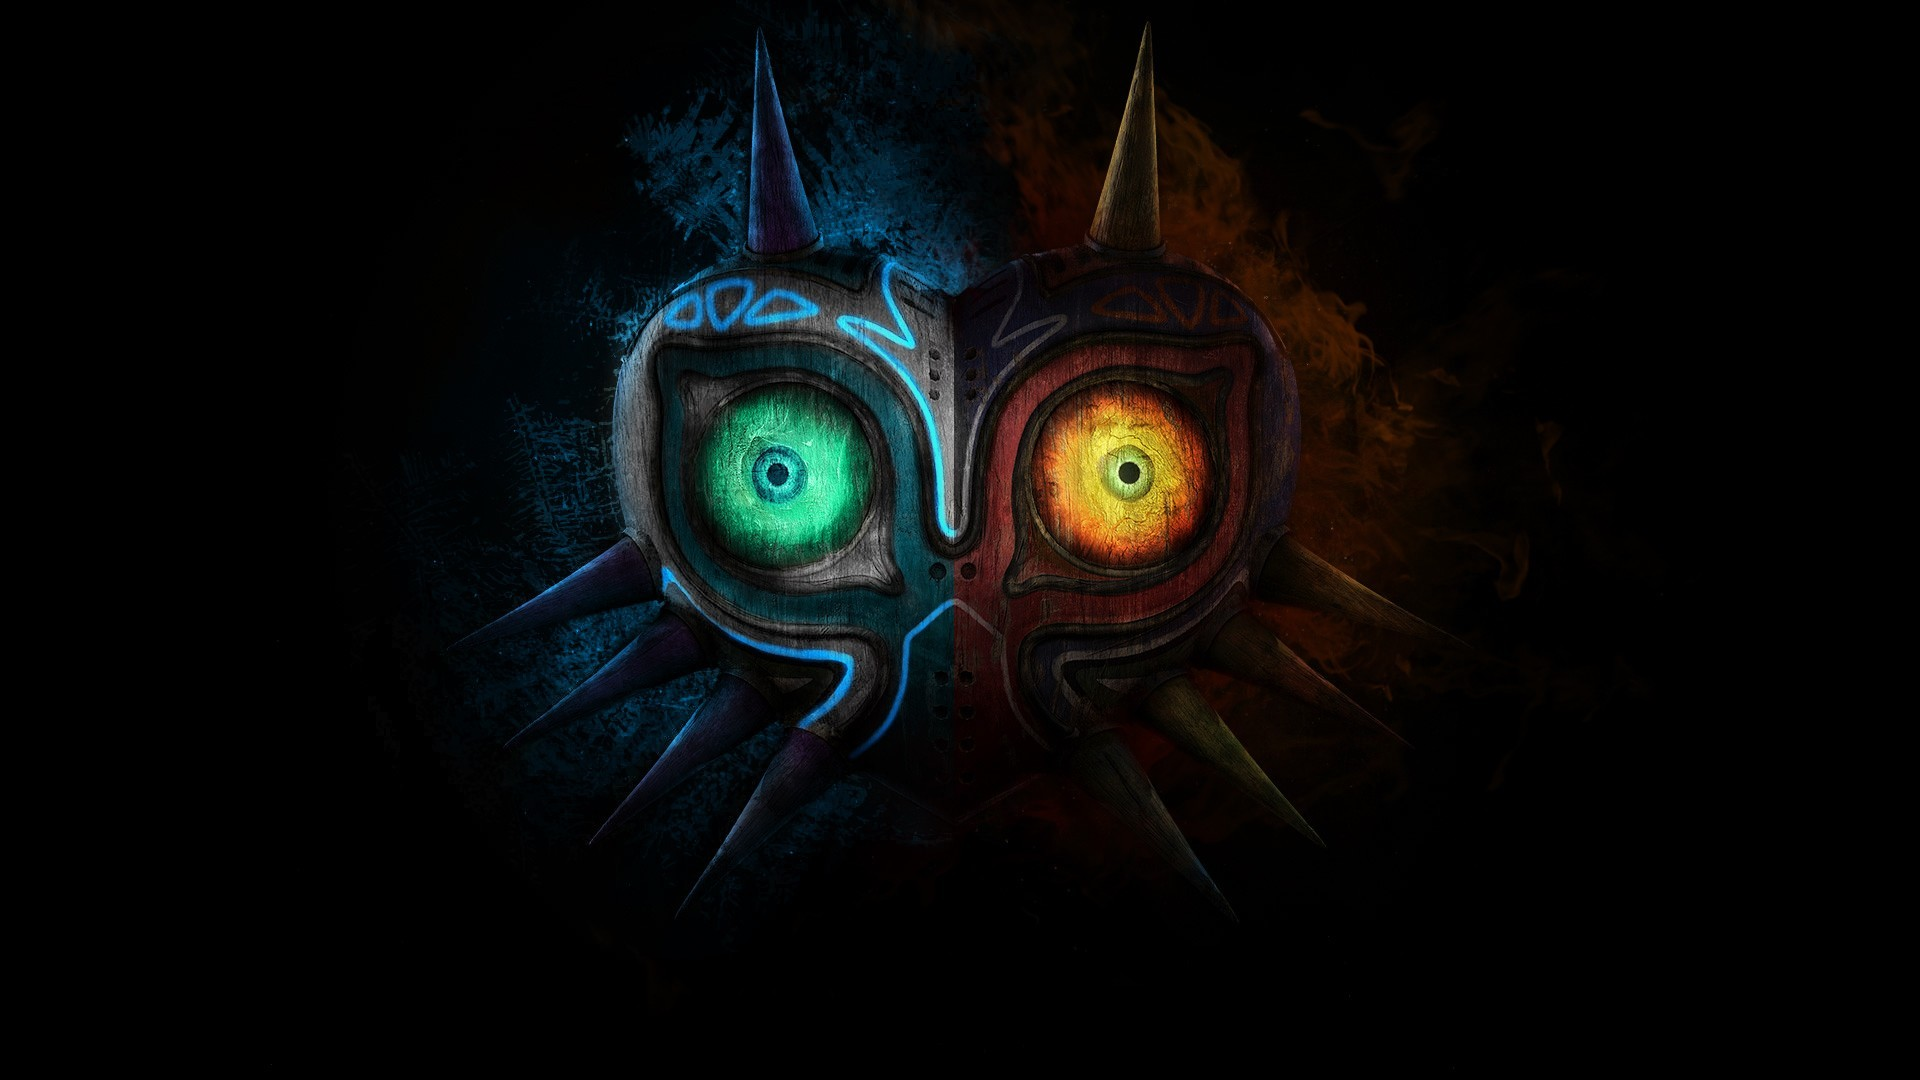 73 The Legend Of Zelda: Majora's Mask HD Wallpapers | Backgrounds –  Wallpaper Abyss